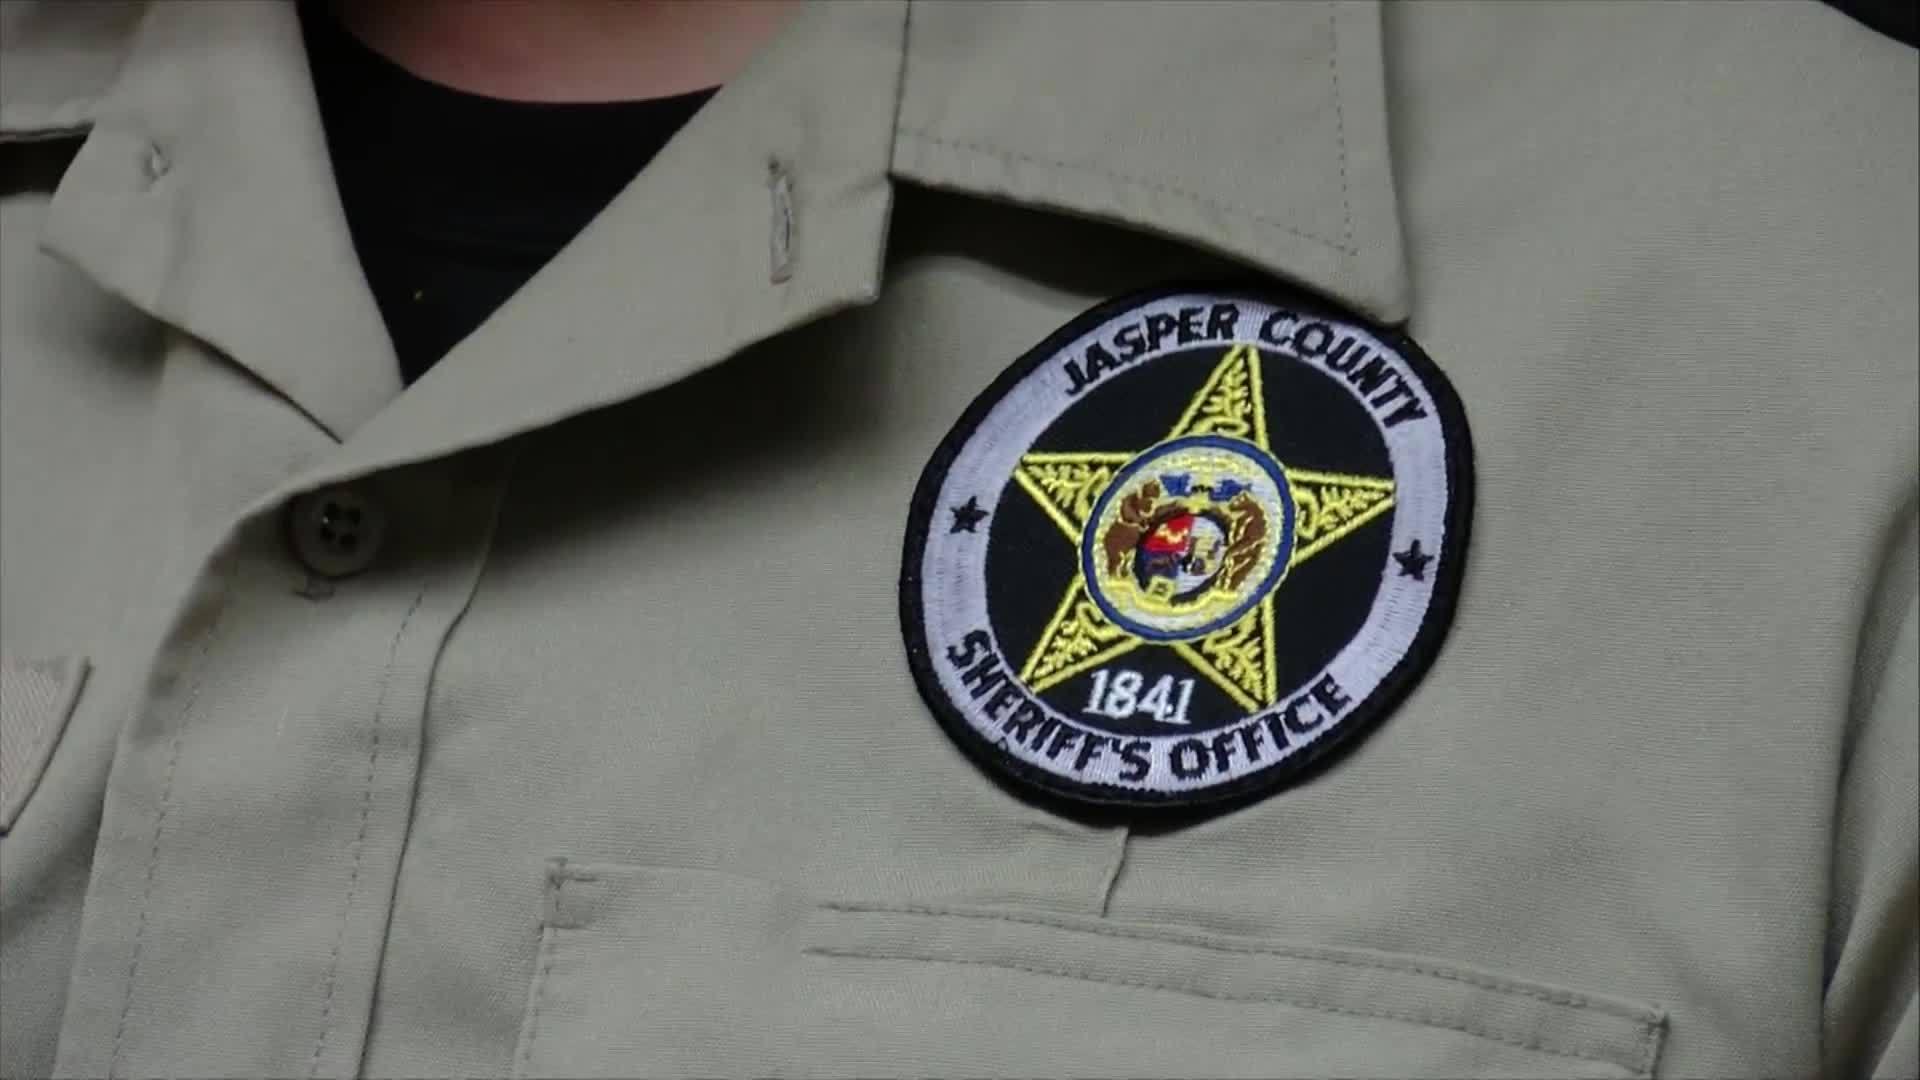 Jasper_County_Sheriff_s_Office_Awards_Ce_6_20190416033324